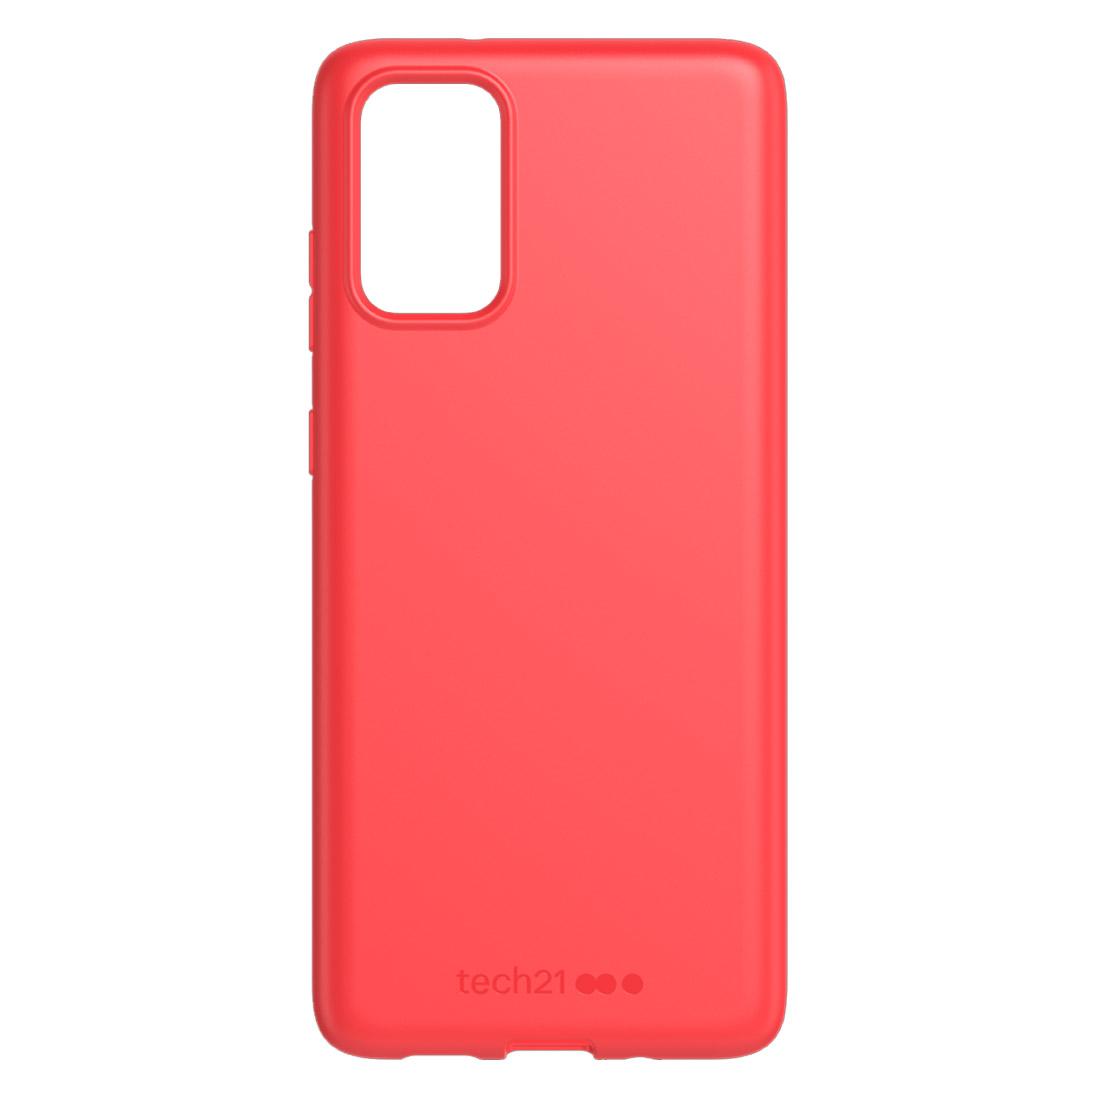 Tech21 Studio Colour Case for Samsung Galaxy S20+ Plus T21-7694 - Cherry